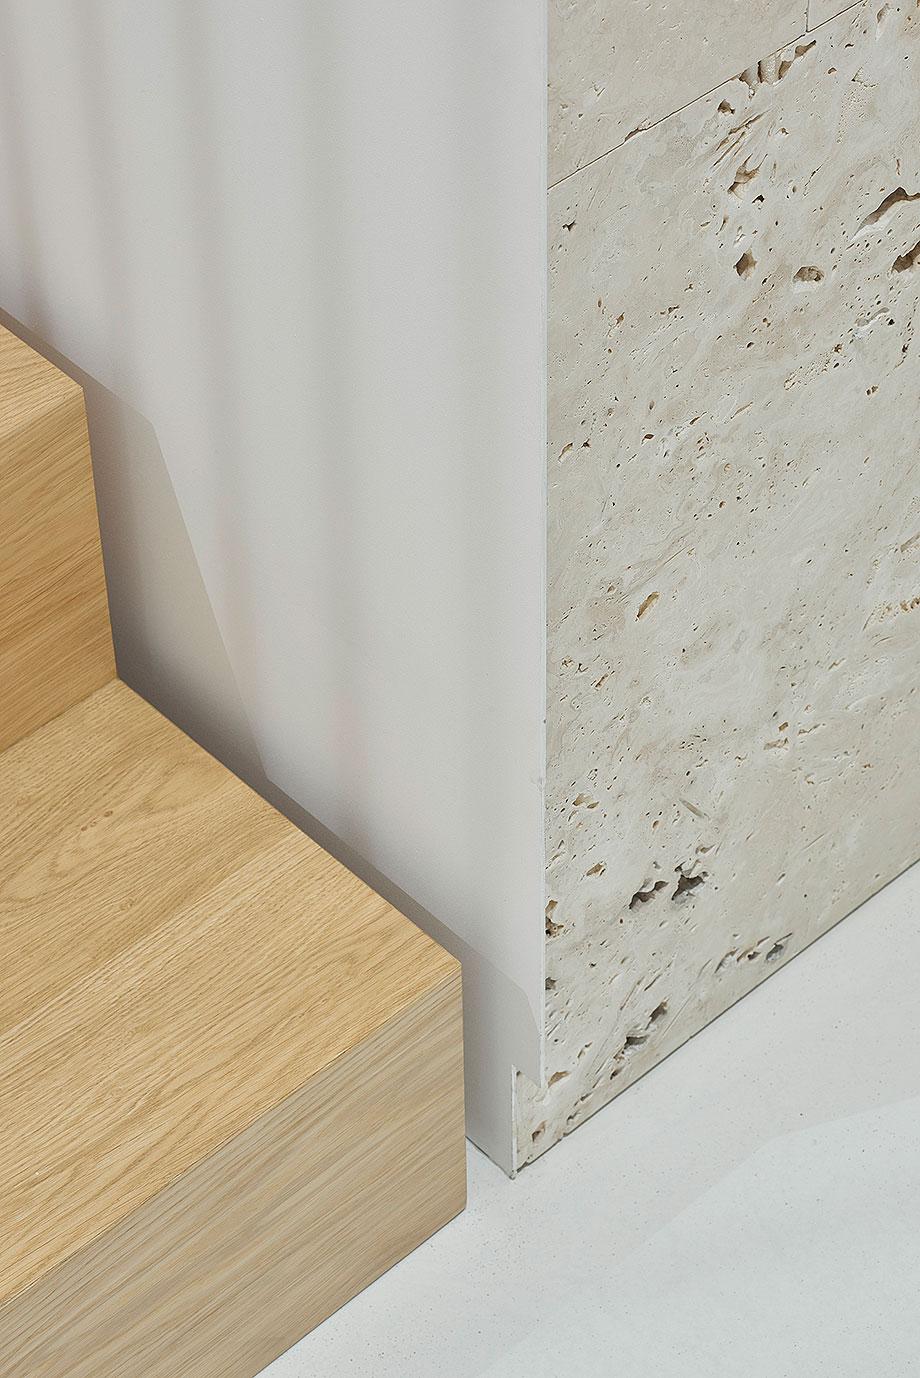 apartamento con un muro de piedra revestido con travertino por 2xj architects (8) - foto darius petrulaitis